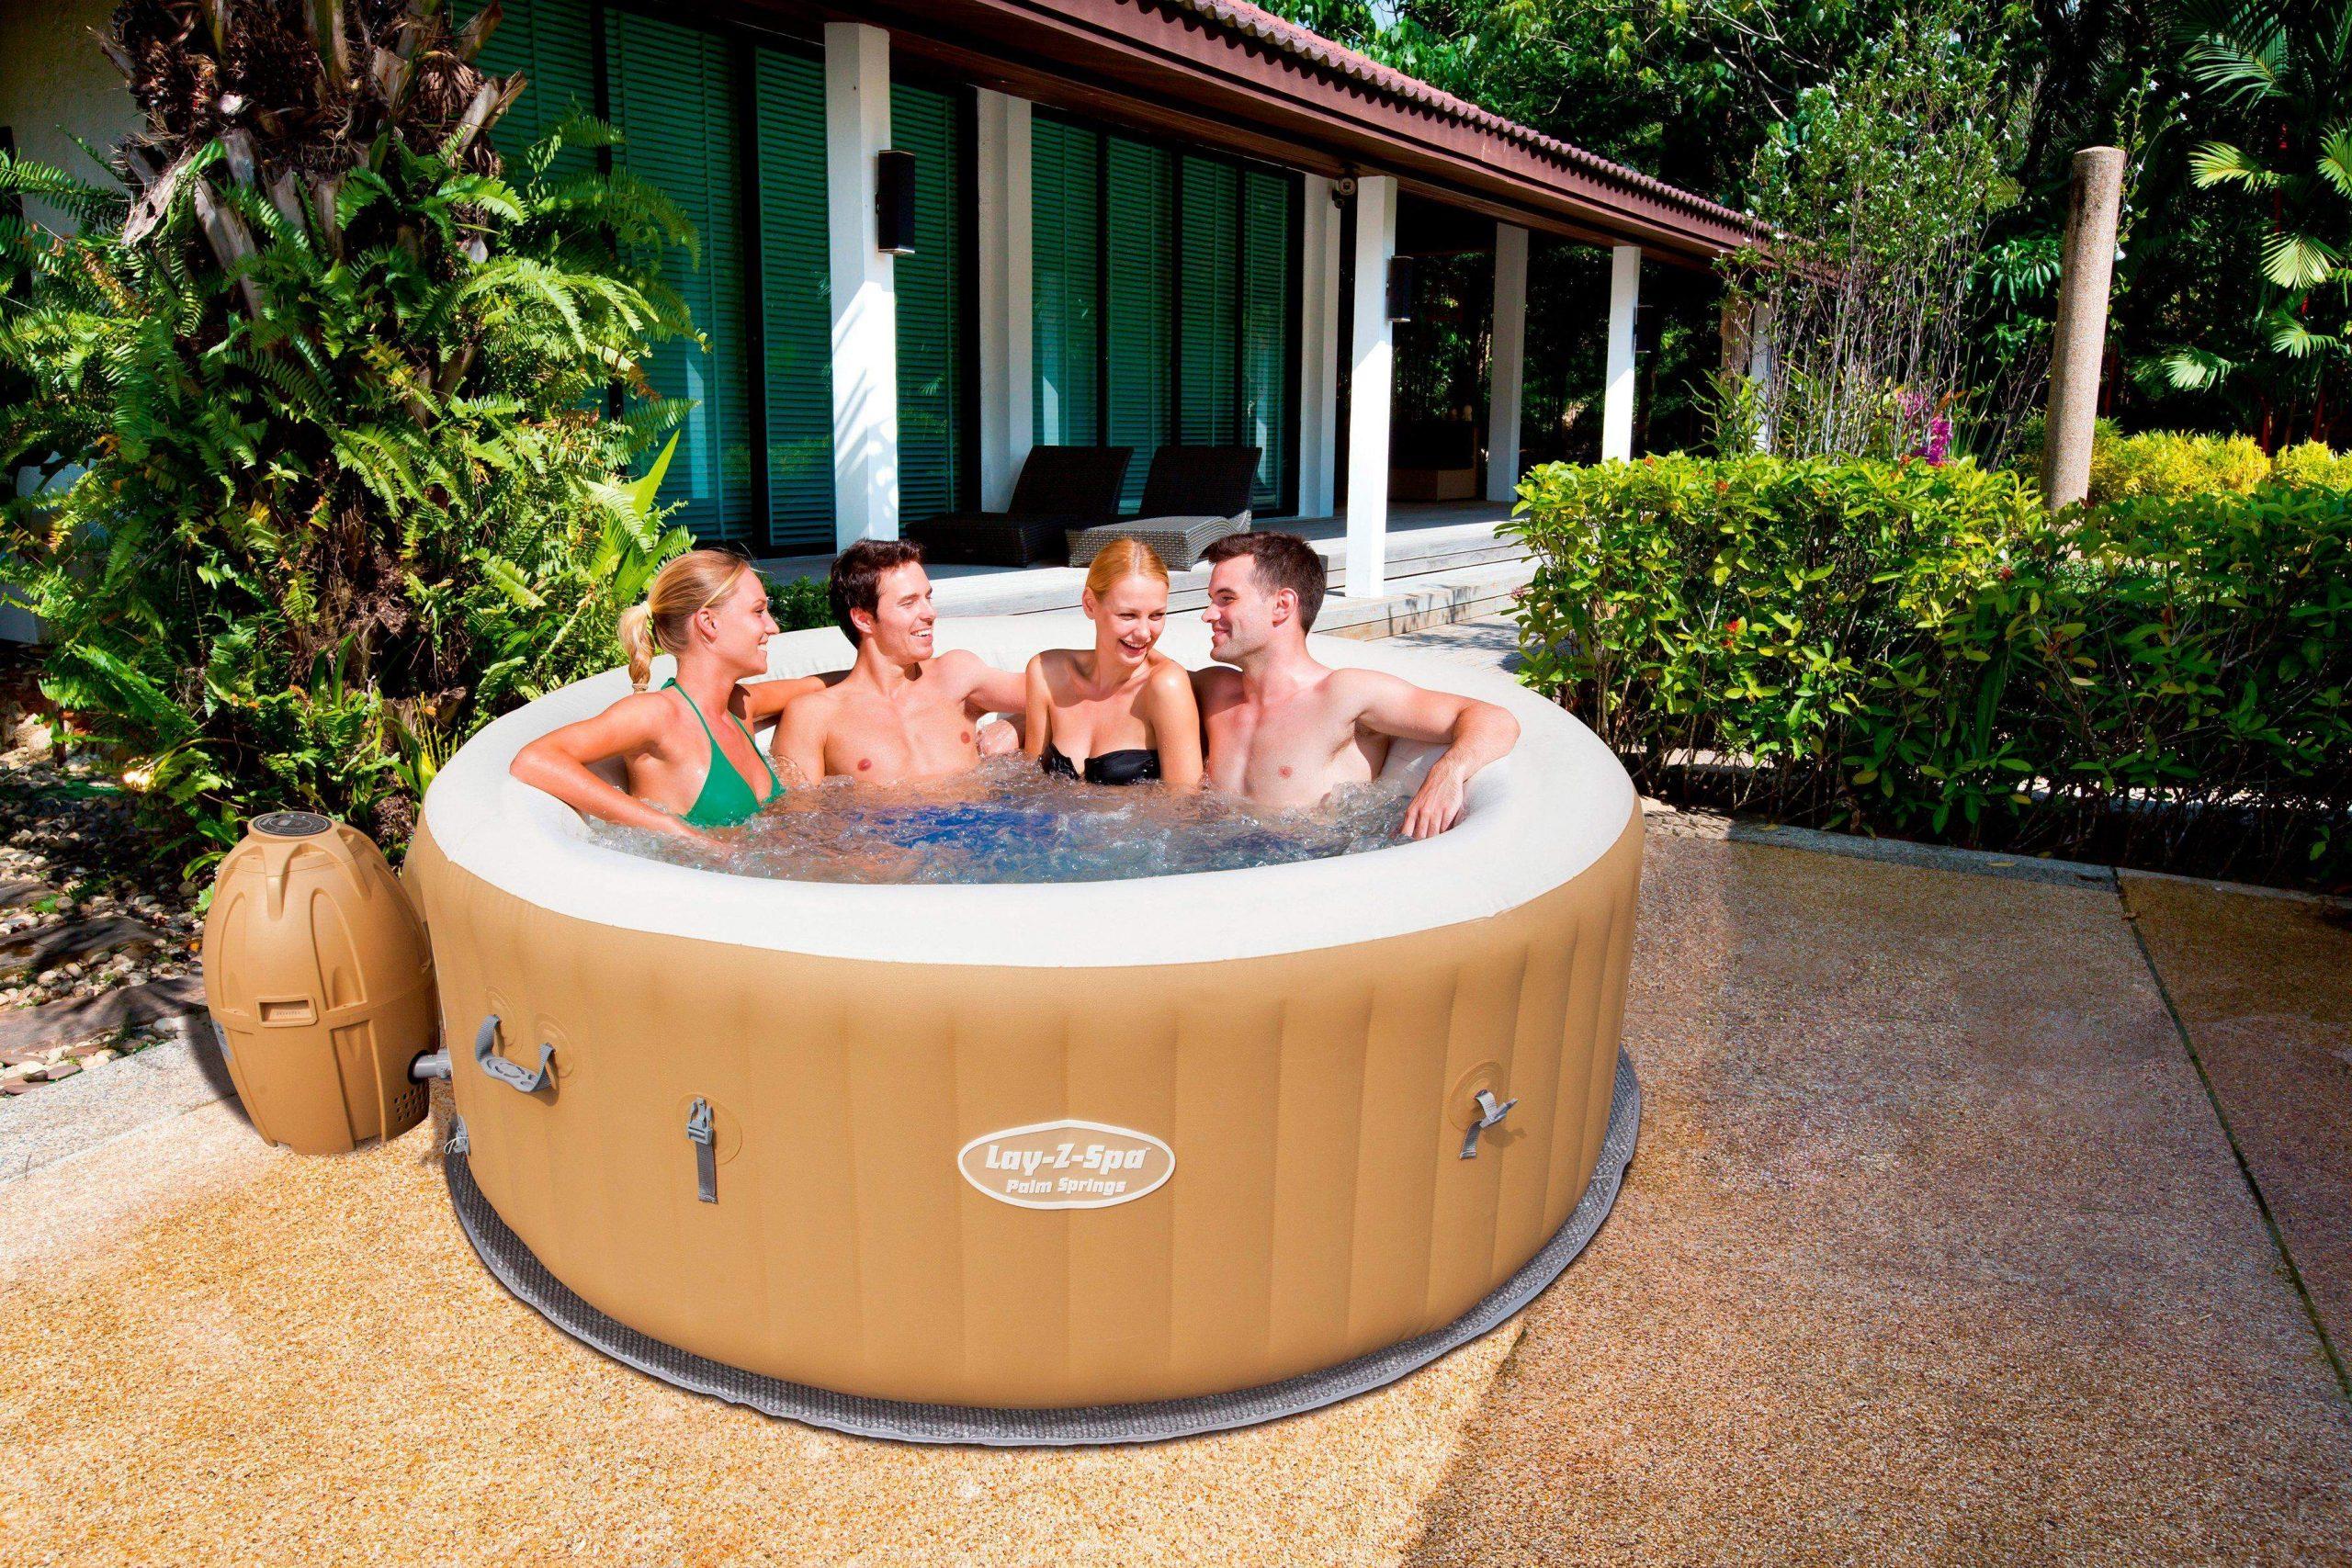 Whirlpool Garten Luxus Bestway Whirlpool Lay Z Spa™ Palm Springs Airjet™ ˜xh 196×71 Cm